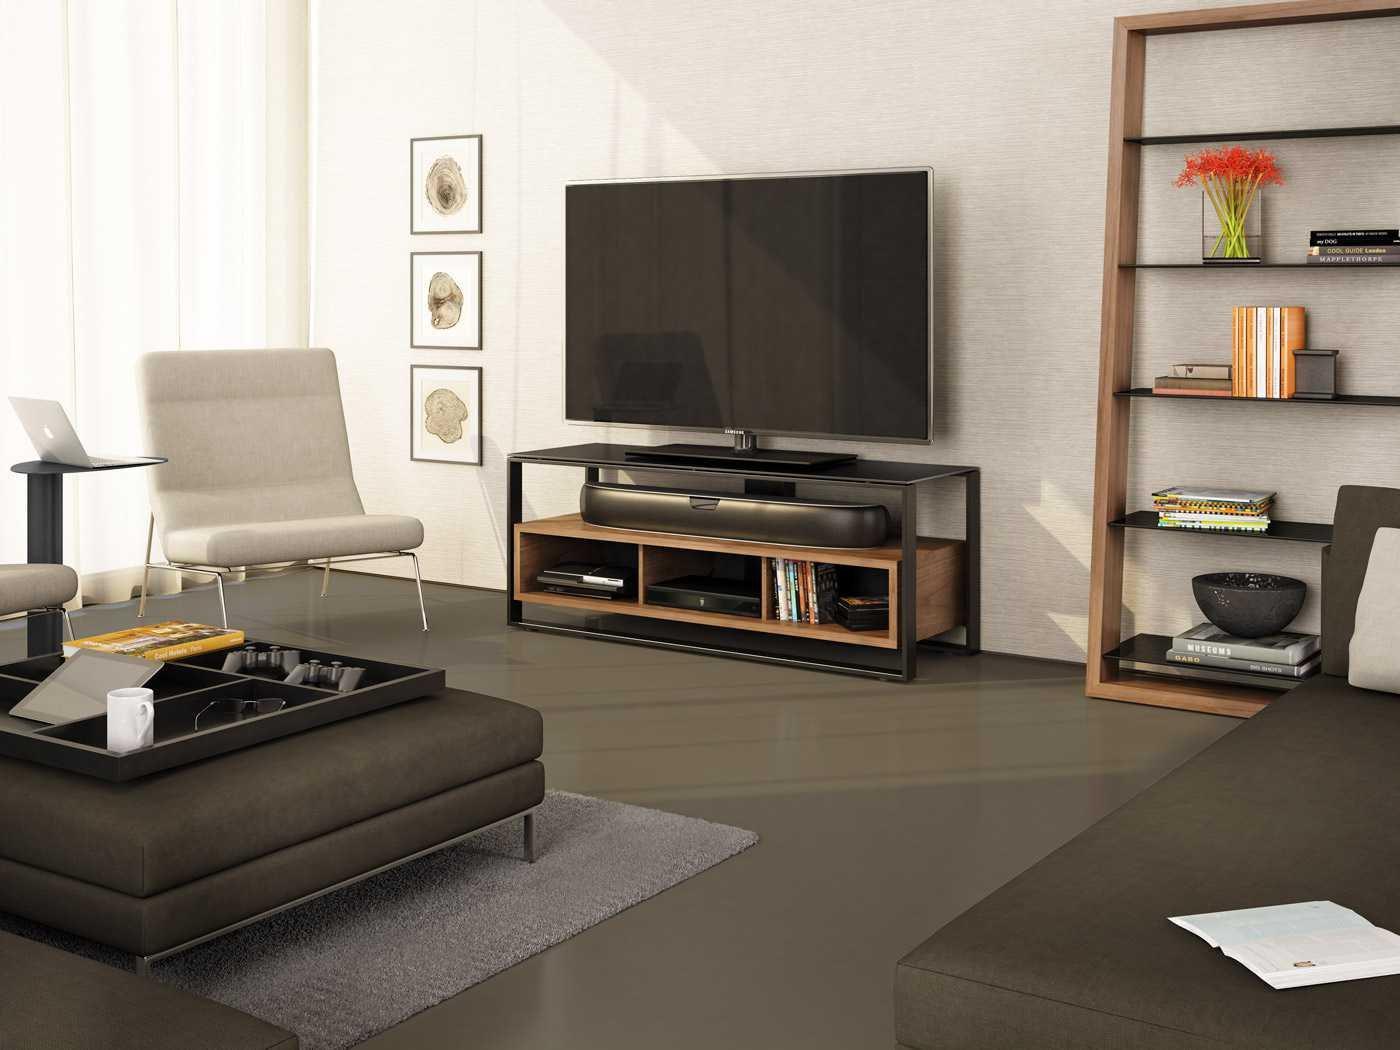 BDI Eileen 34L x 74H Natural Walnut Leaning Shelf Bookcase | BDI5156WL